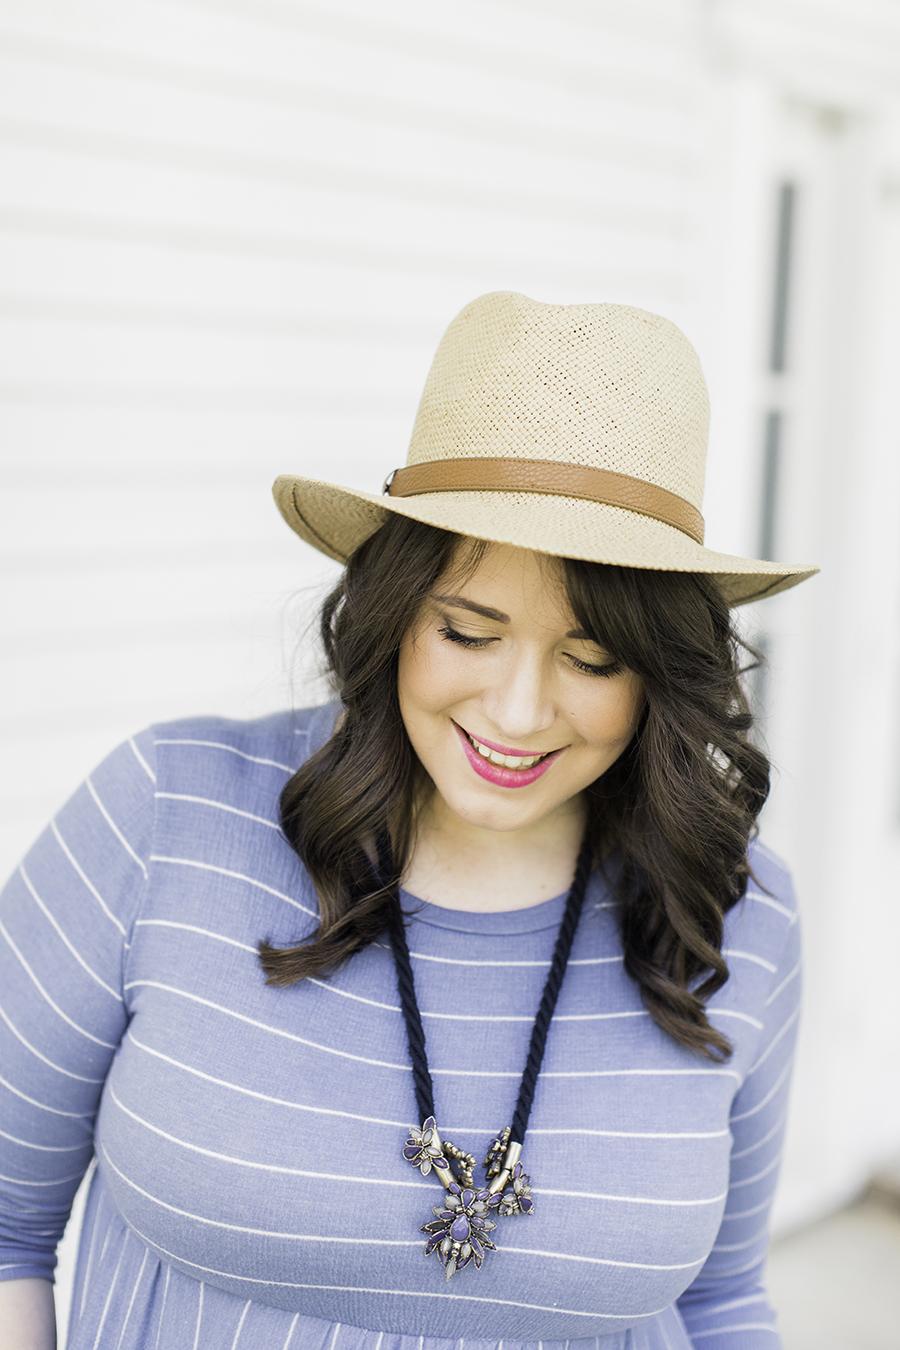 Jordan Brittley — photo and editing tips for creative entrepreneurs.jpg